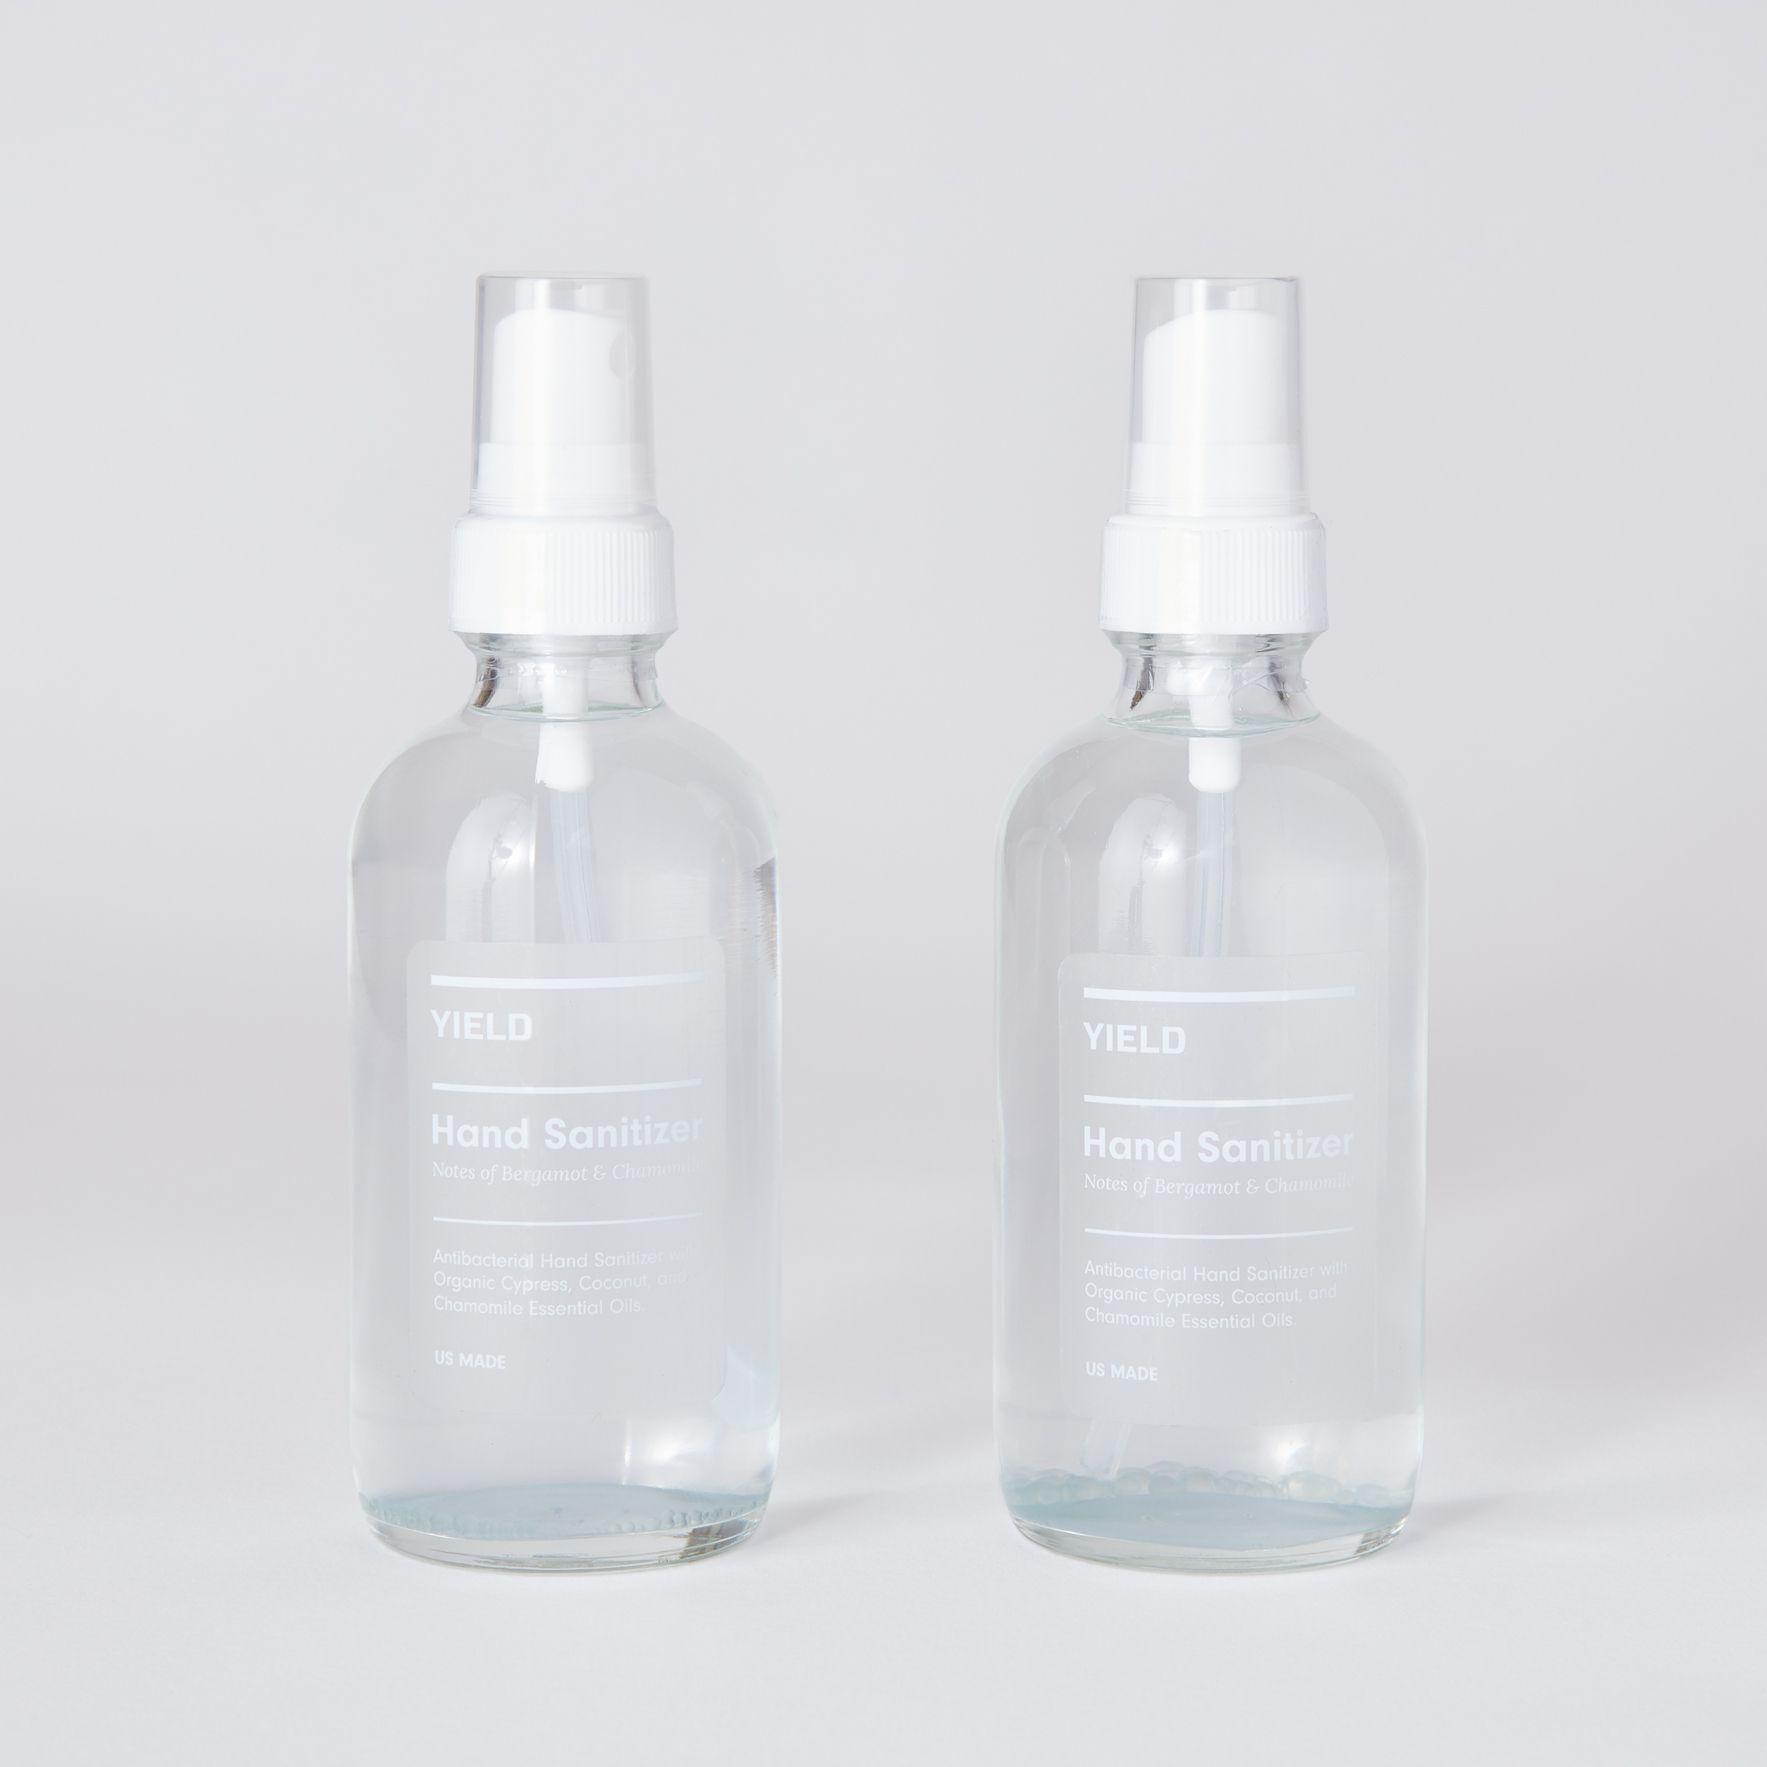 Sanitizer by Soma Het